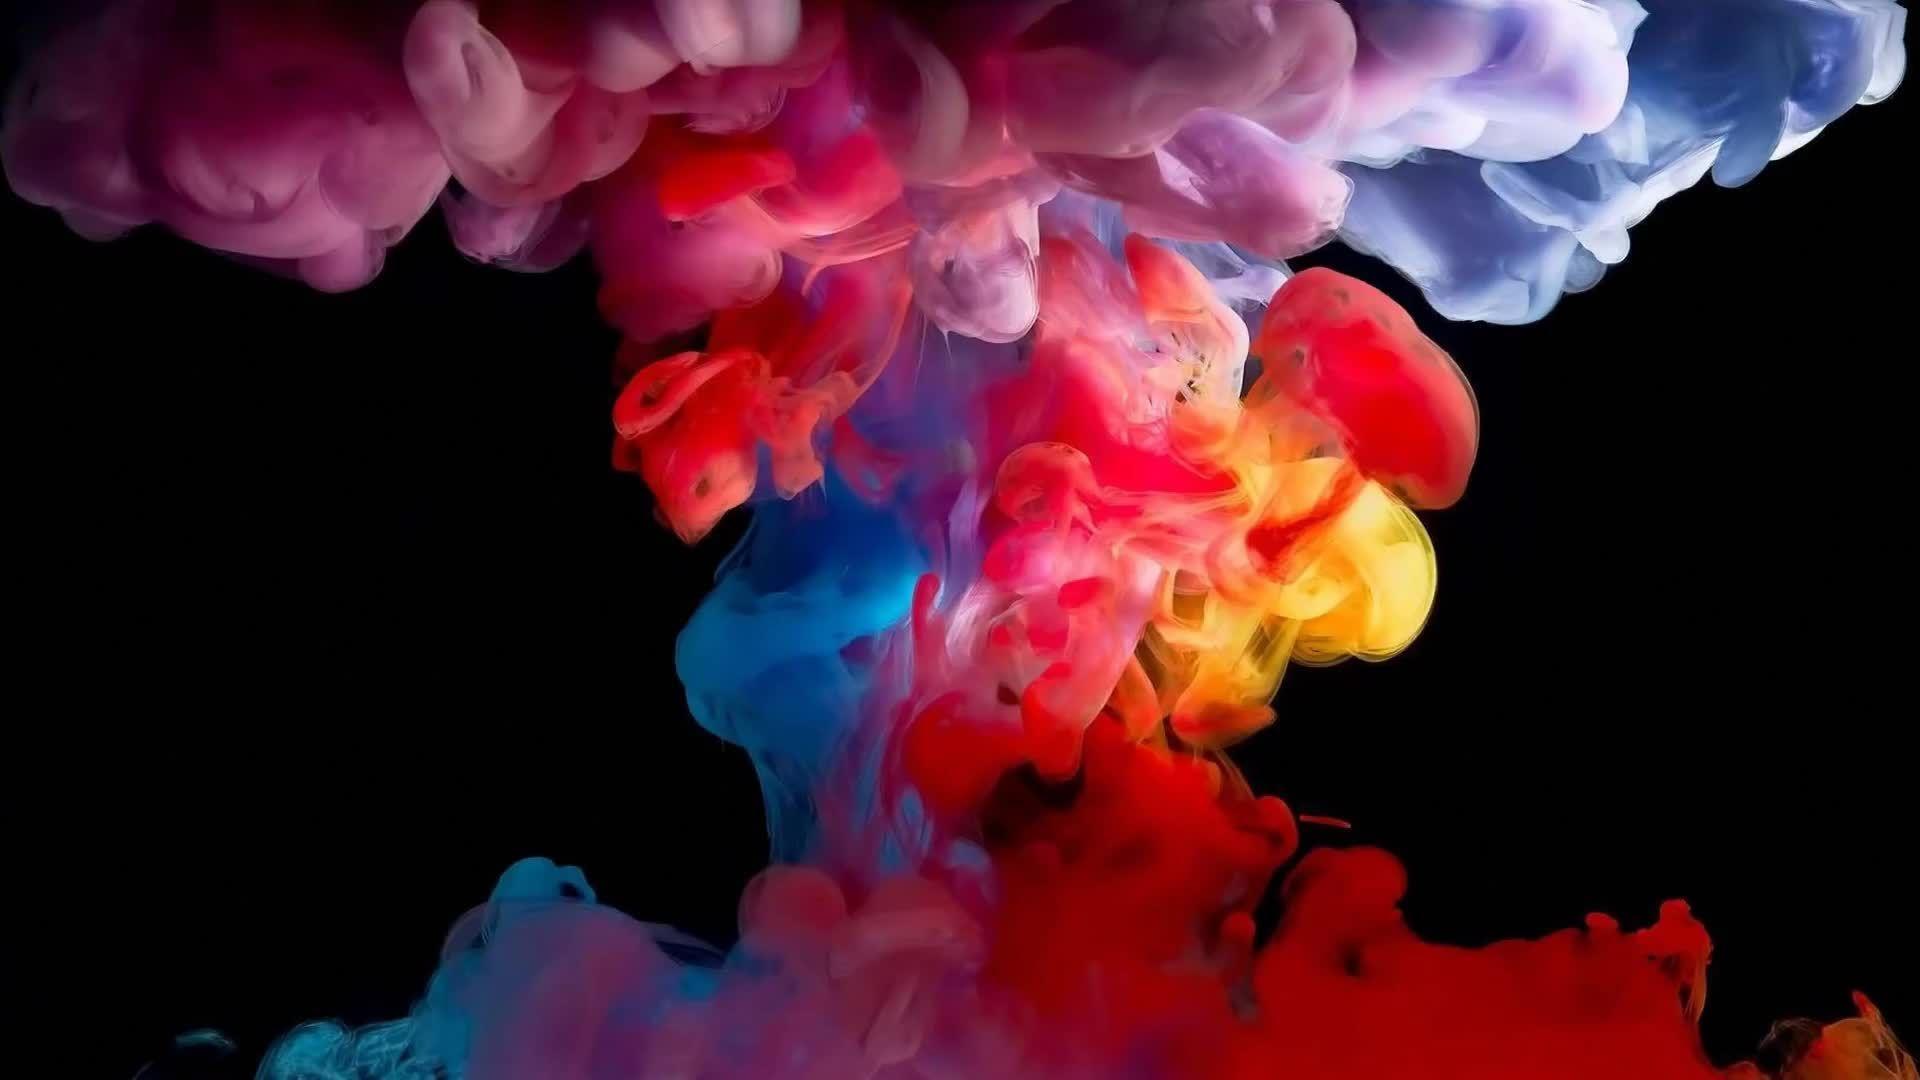 Artistic Colorful Smoke Live Wallpaper